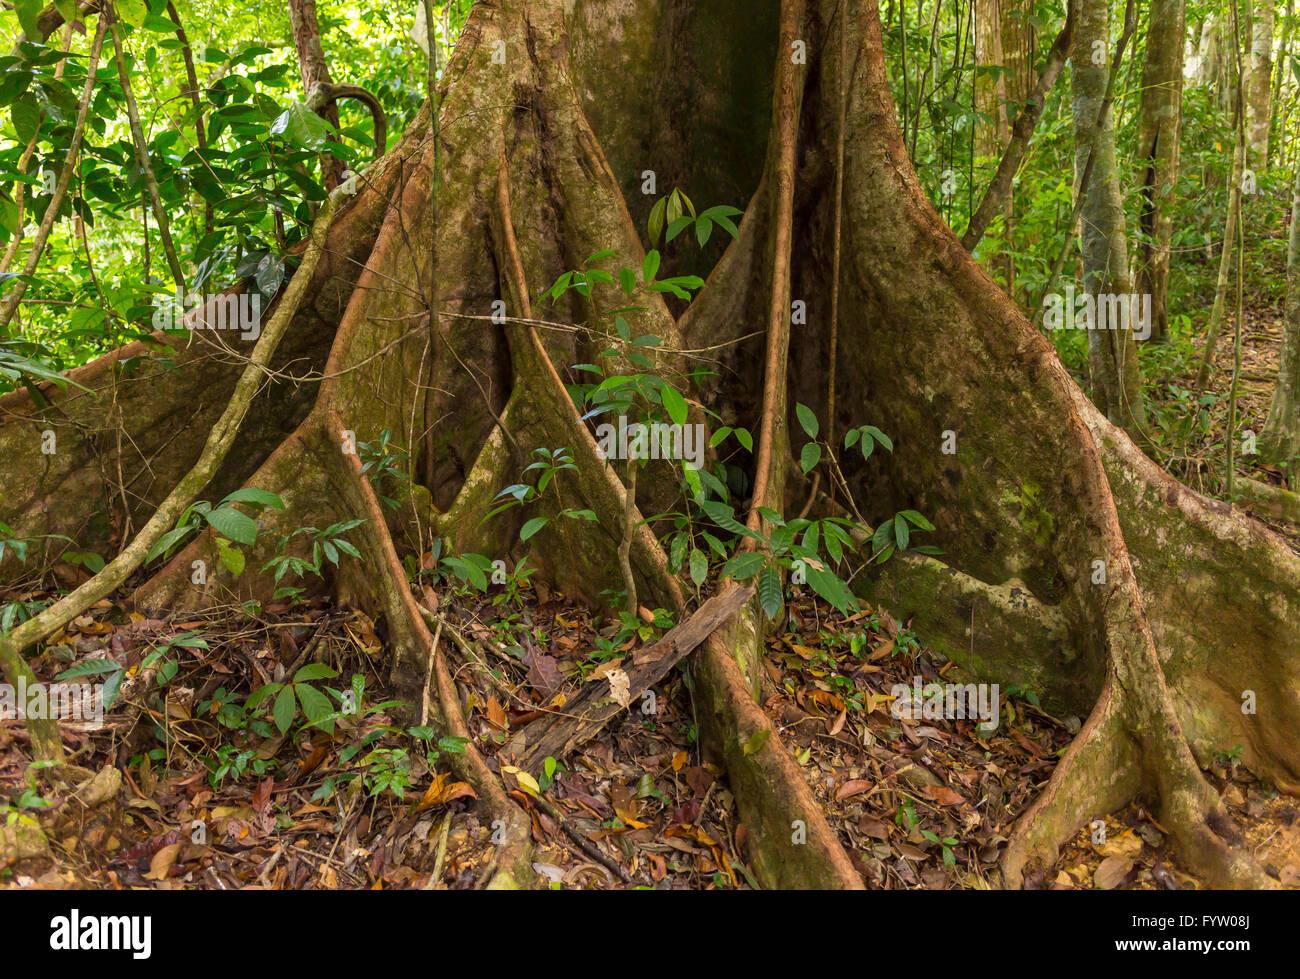 OSA PENINSULA, COSTA RICA - Royal mahogany tree in primary rain forest. (Carapa guianensis). Local names: caobilla - Stock Image